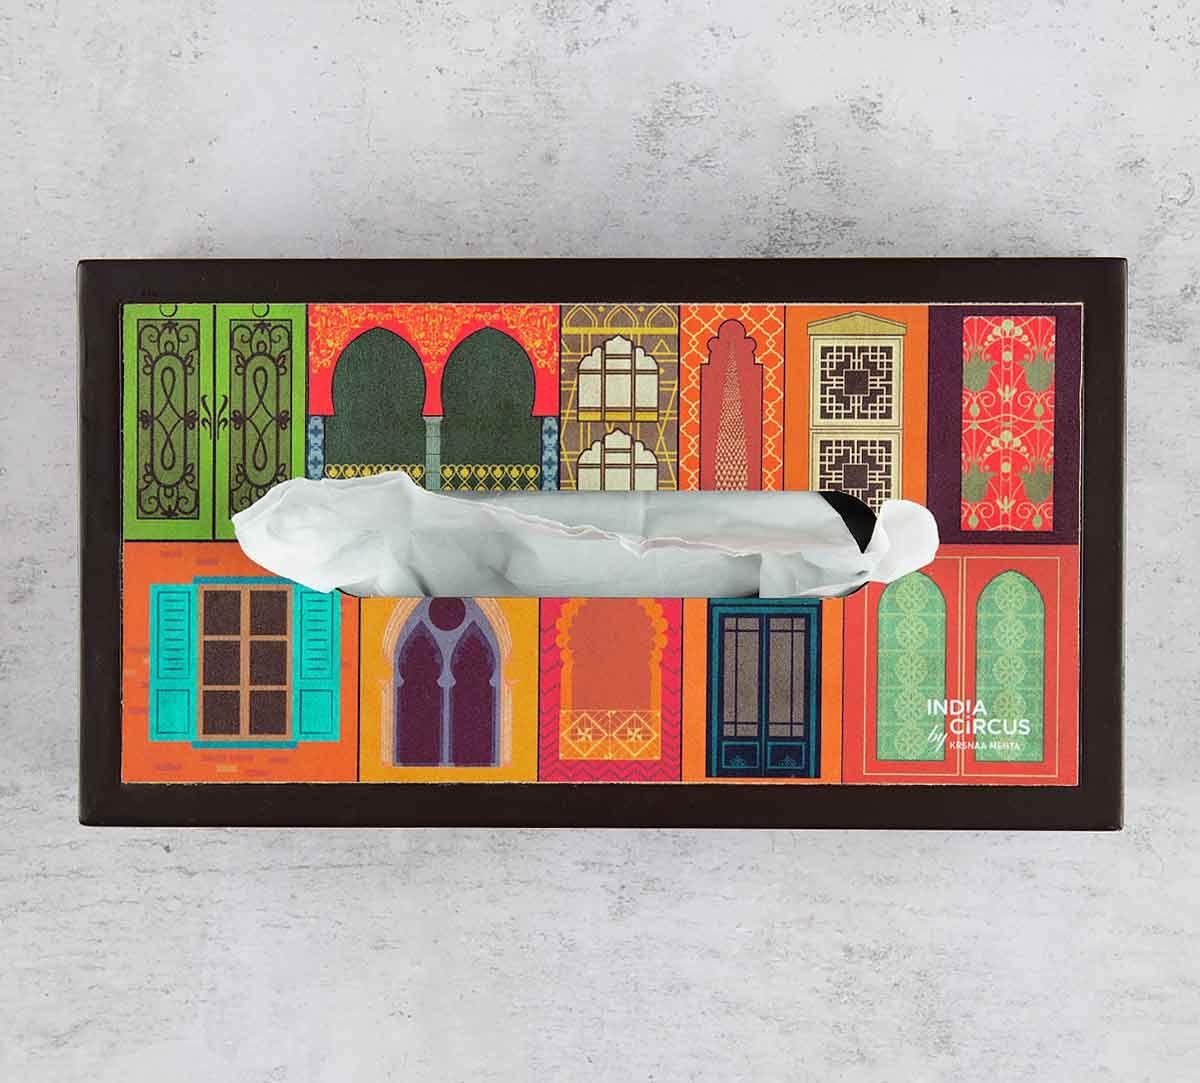 India Circus Mughal Doors Reiteration MDF Tissue Box Holder